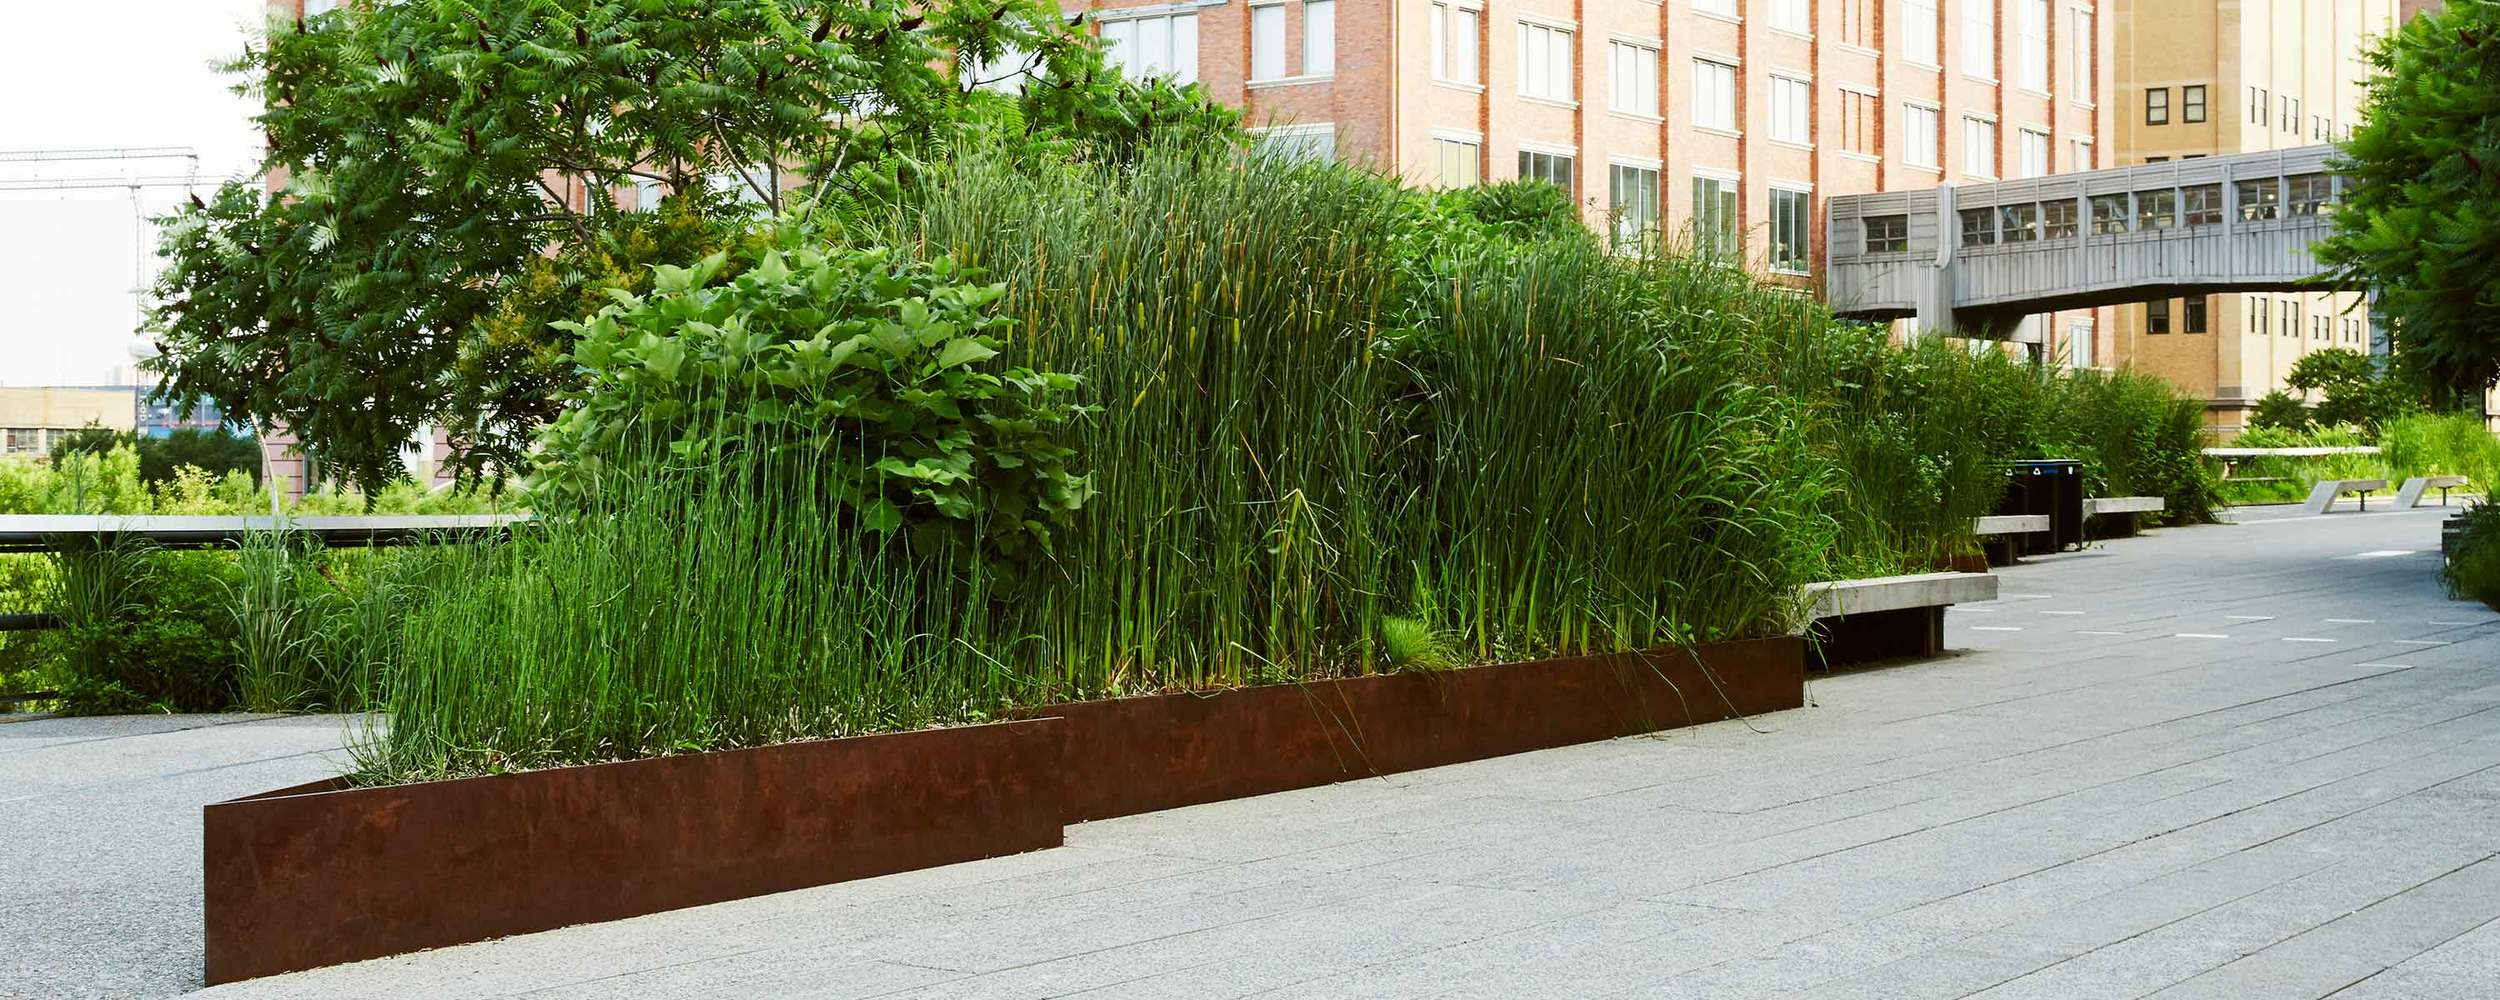 The High Line James Corner Field Operations Edging System Corten Steel